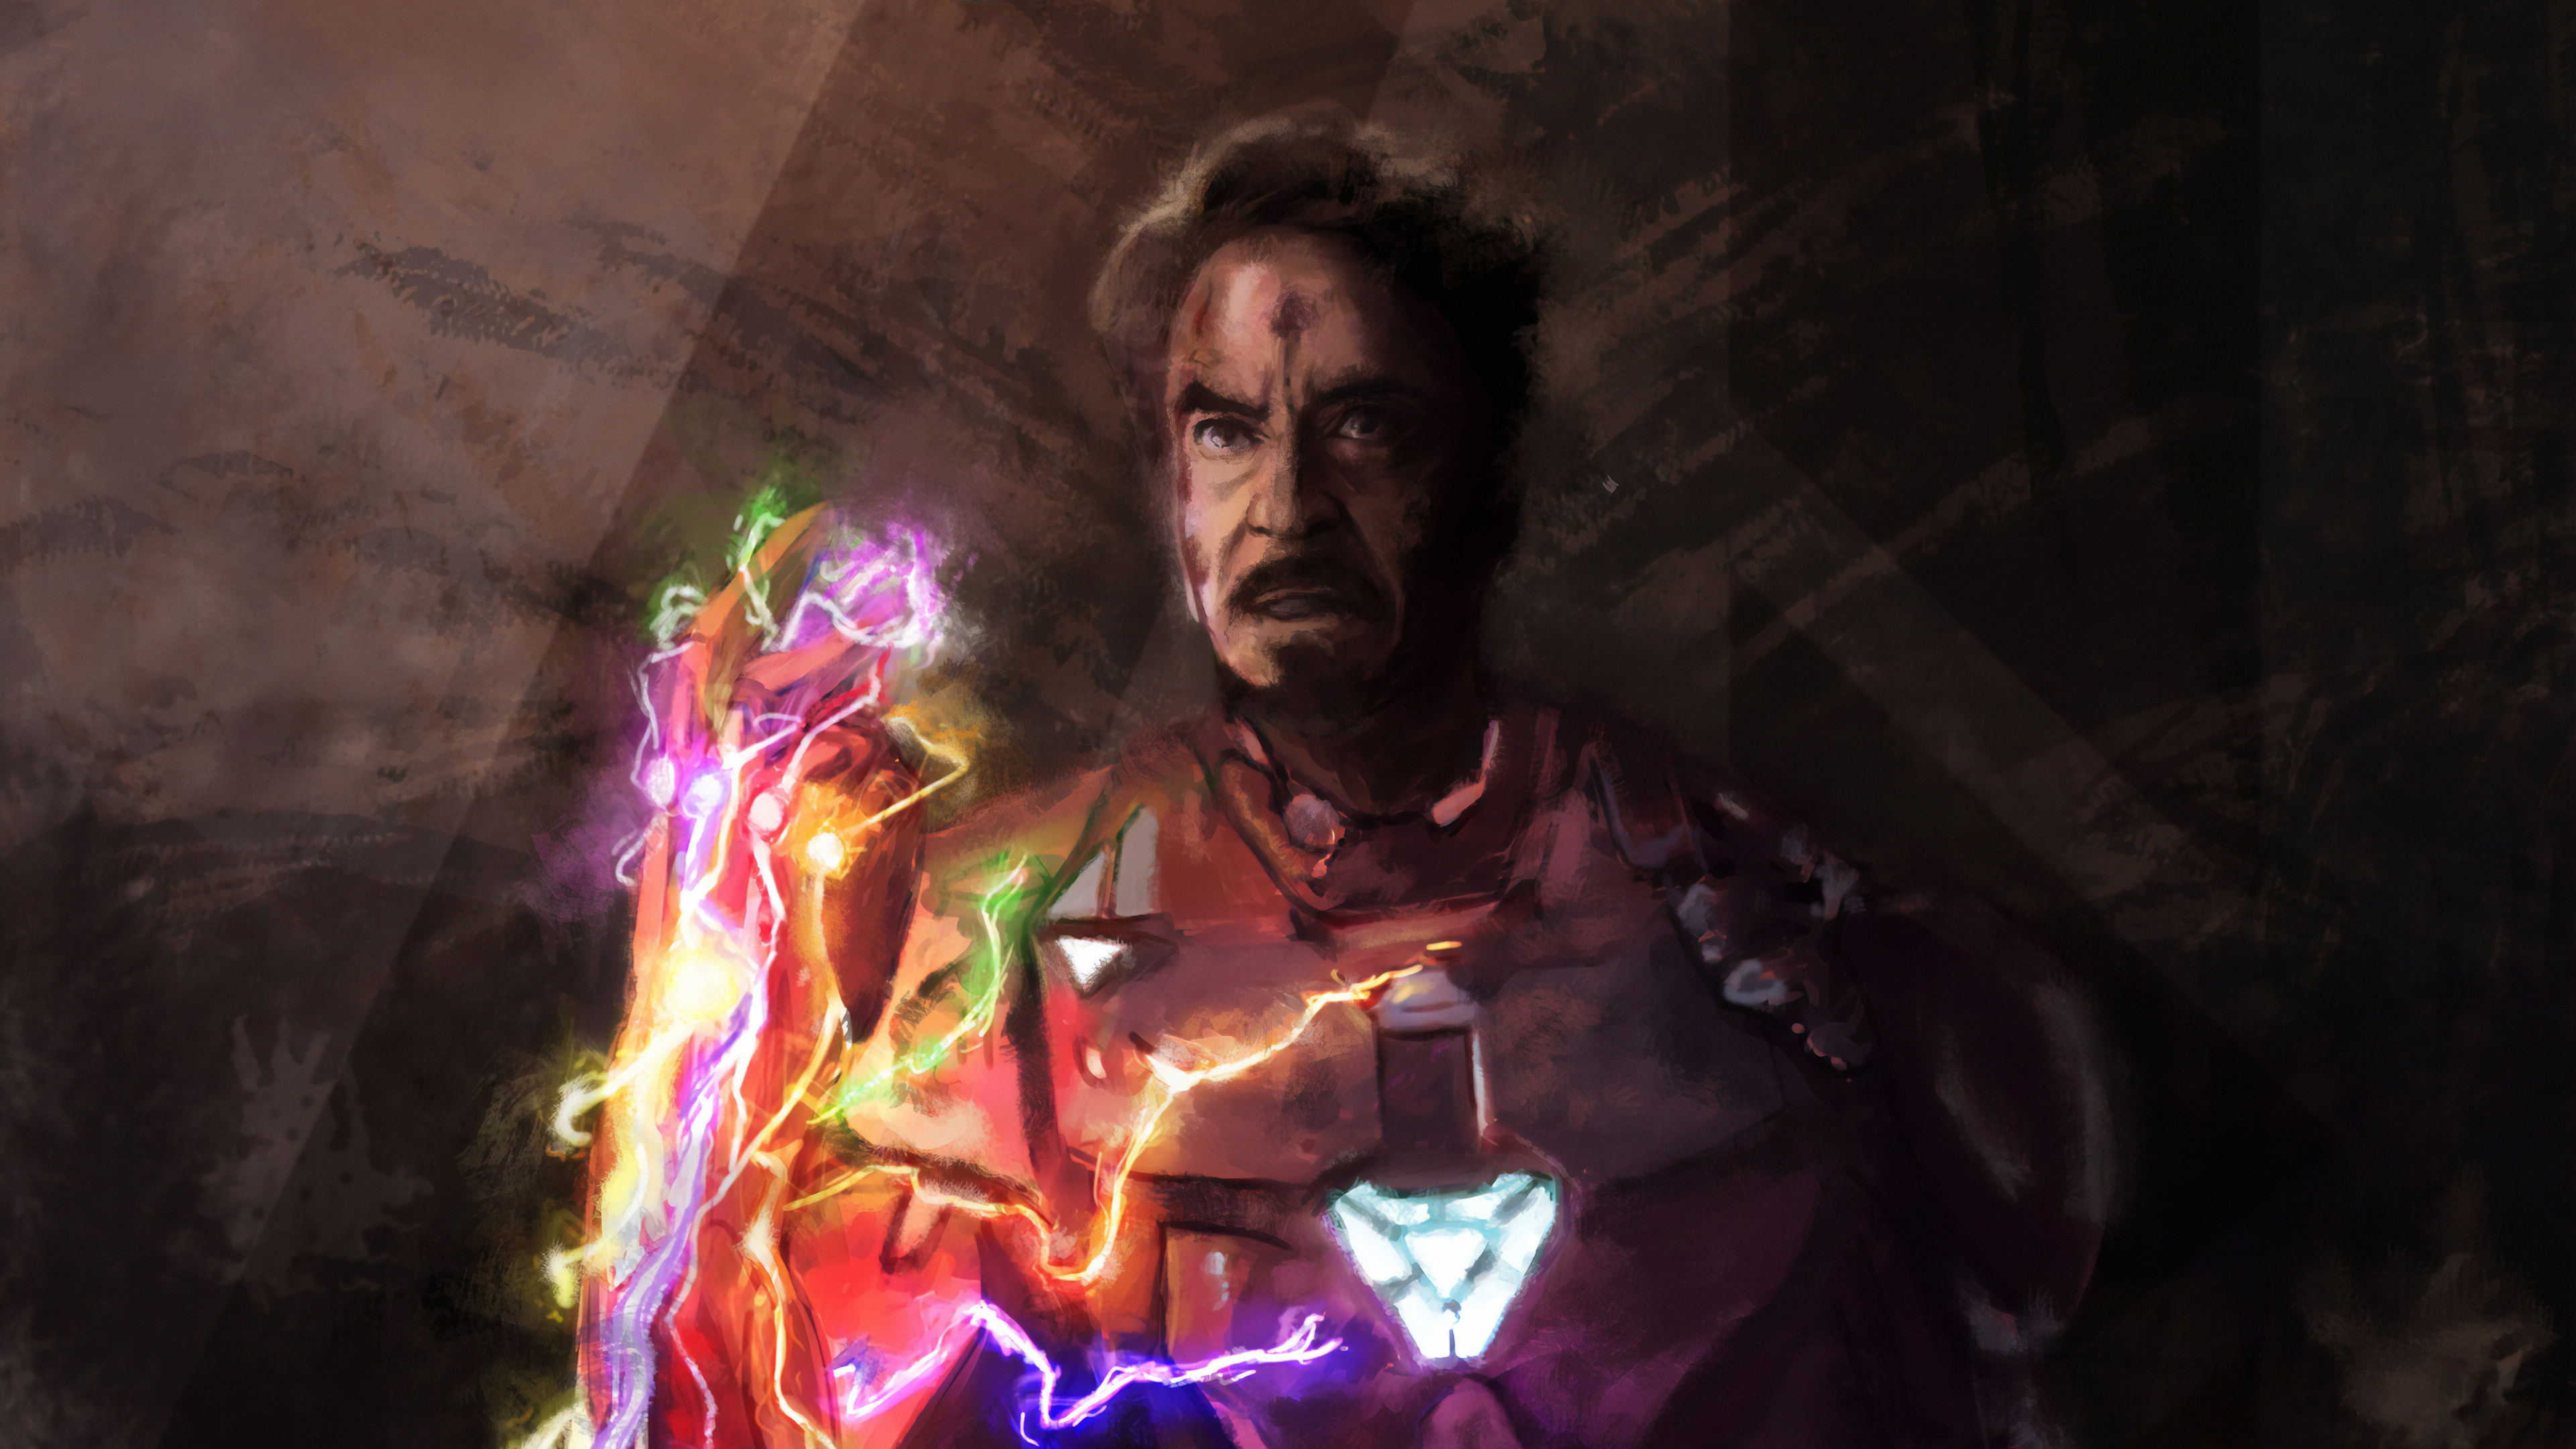 iron man new 1565053917 - Iron Man New - superheroes wallpapers, iron man wallpapers, hd-wallpapers, digital art wallpapers, artwork wallpapers, 4k-wallpapers